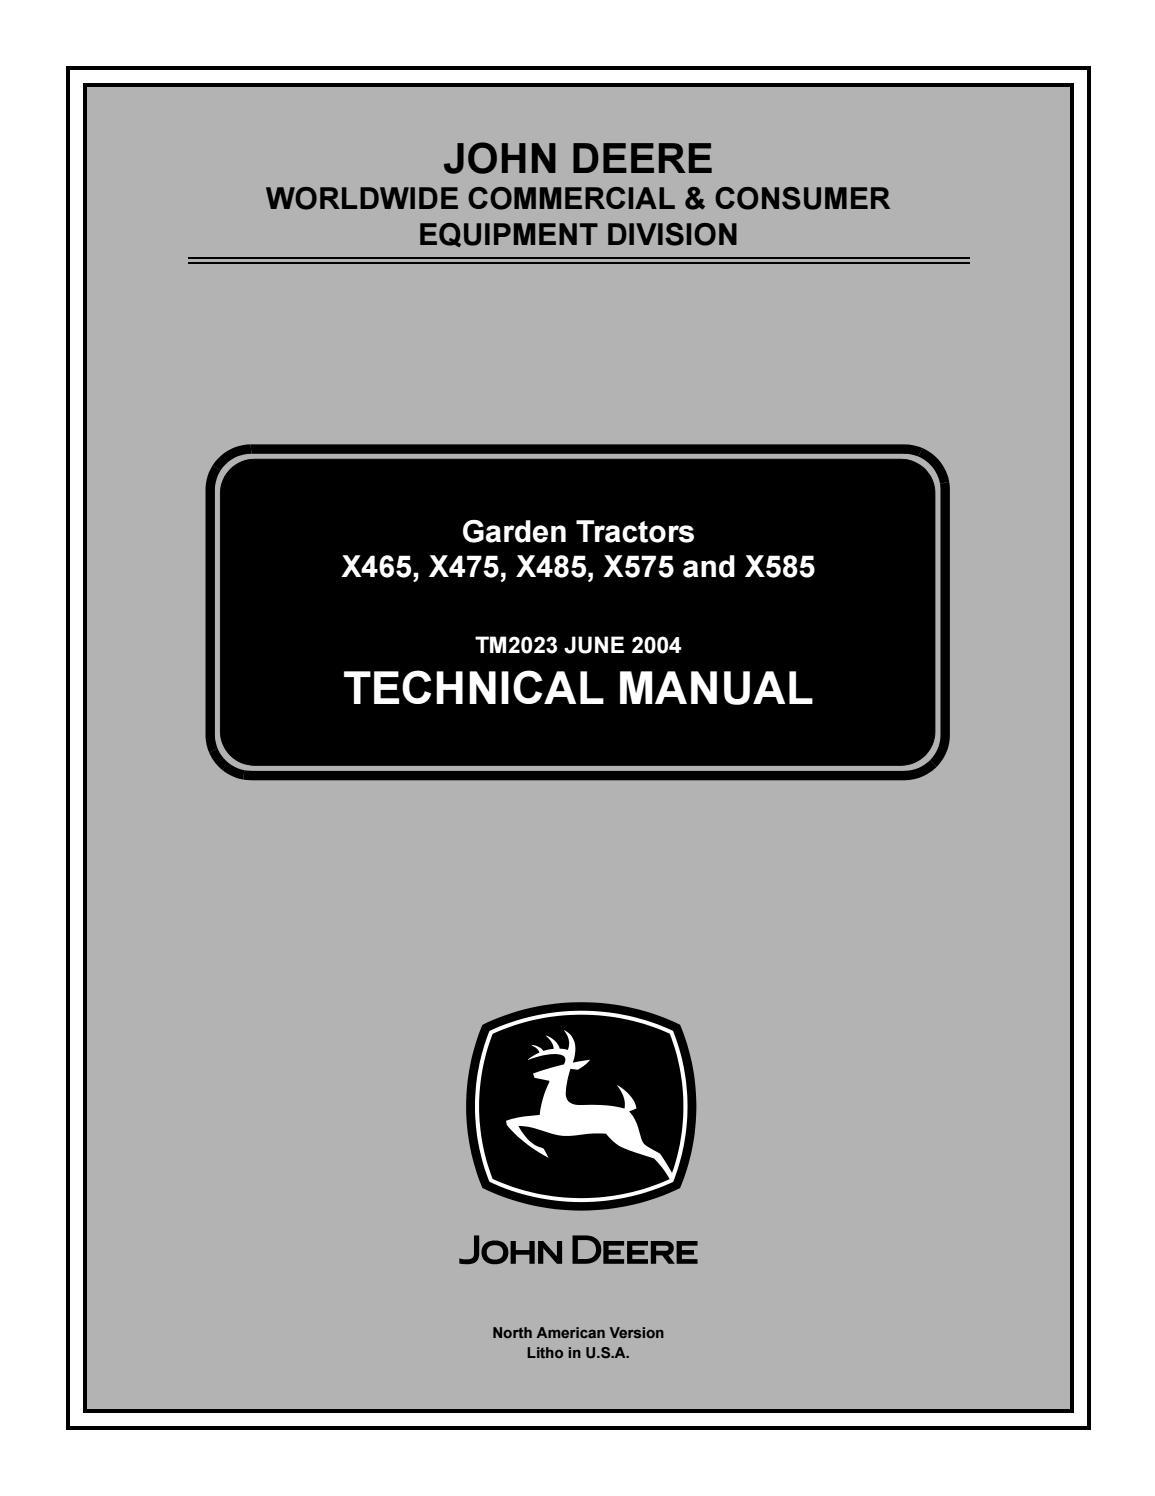 John deere x485 lawn & garden tractor service repair manual by jhjnyiksmm -  issuu | X485 John Deere Wiring Diagram |  | Issuu